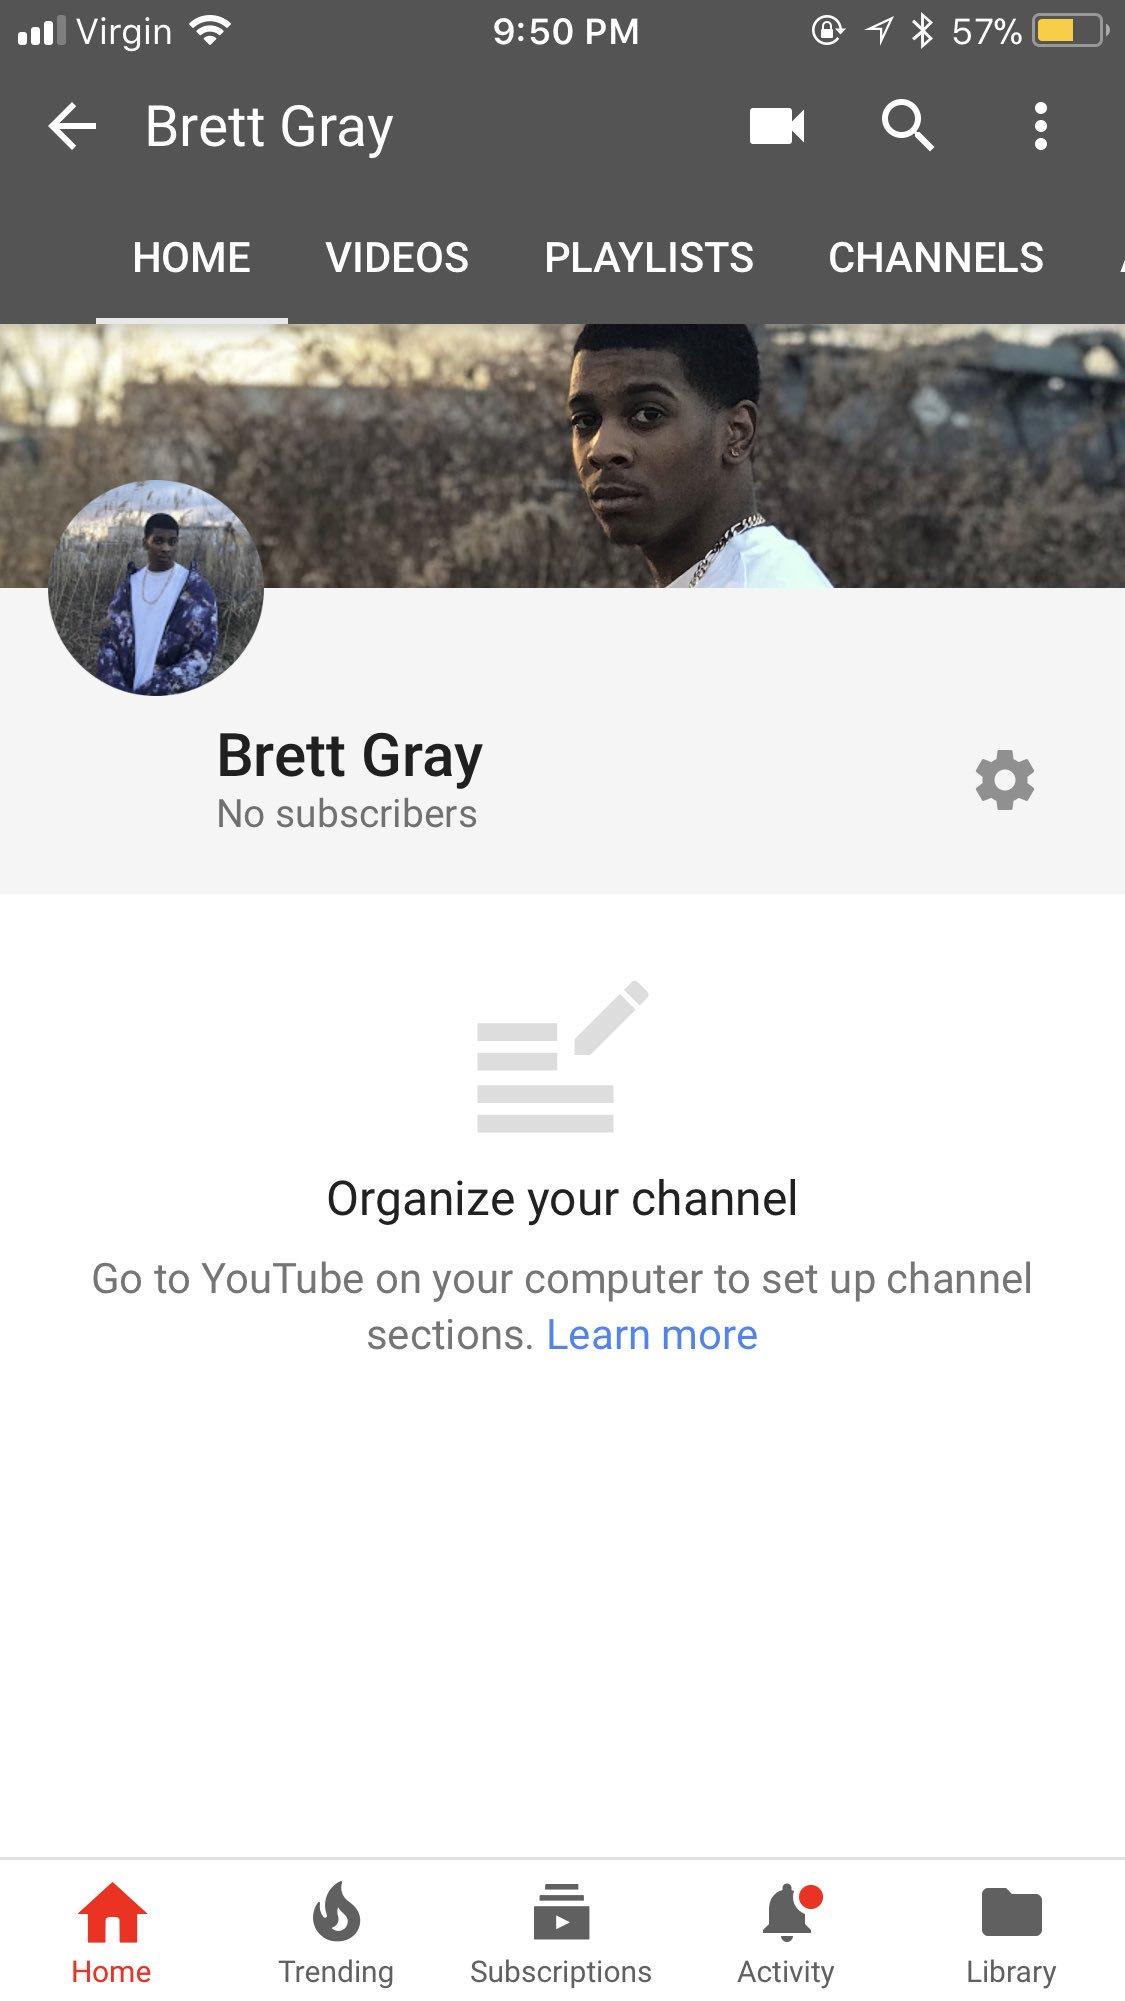 Brett Gray on Twitter: